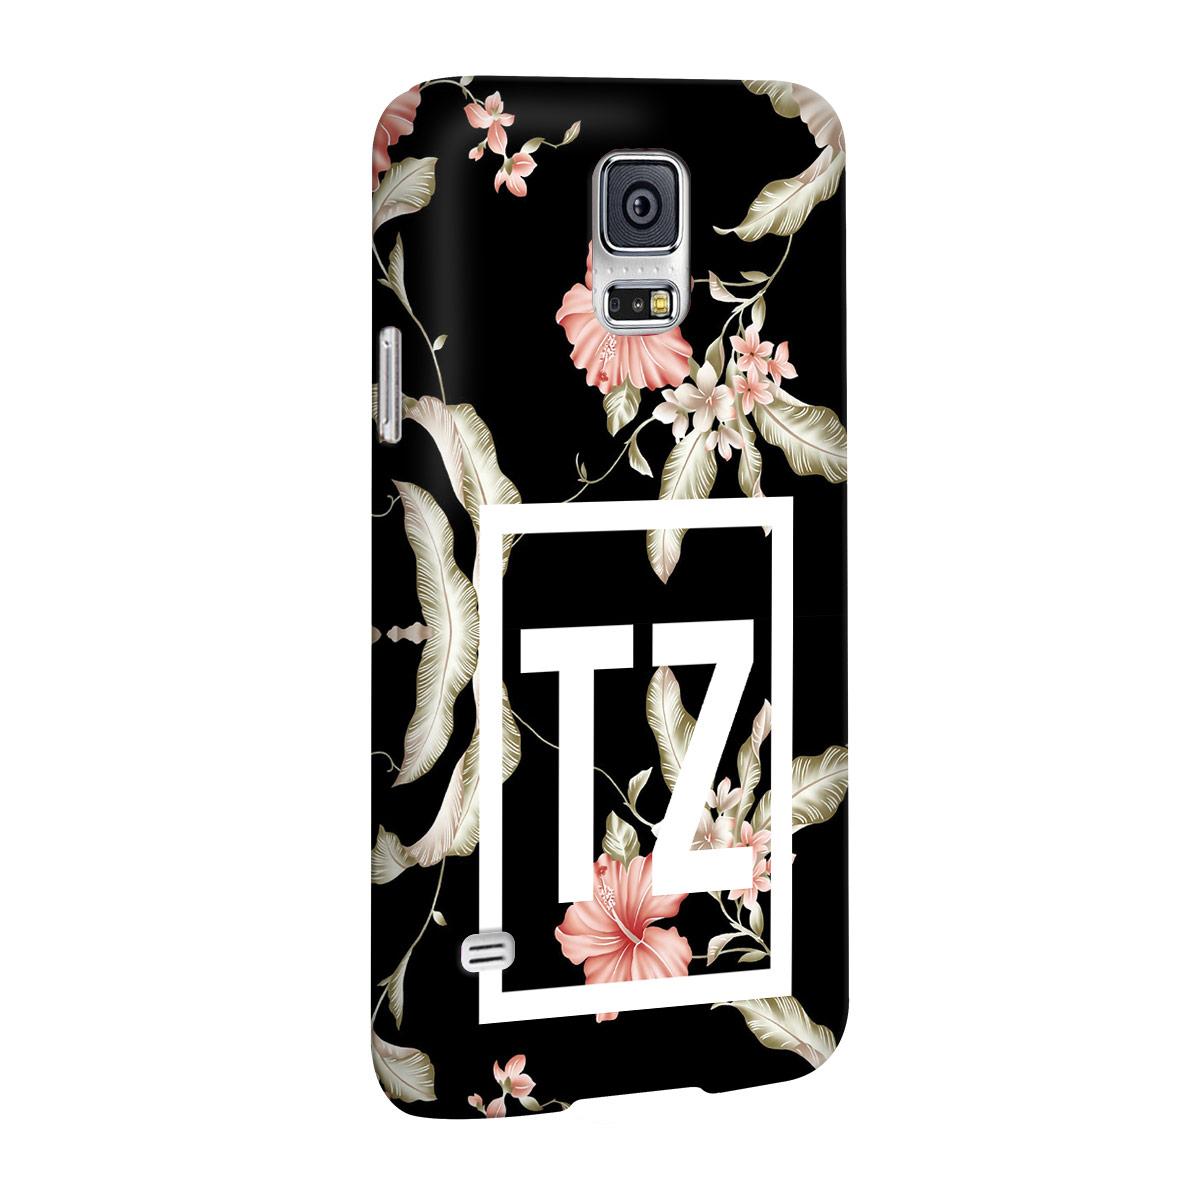 Capa para Samsung Galaxy S5 MC Tati Zaqui Flowers